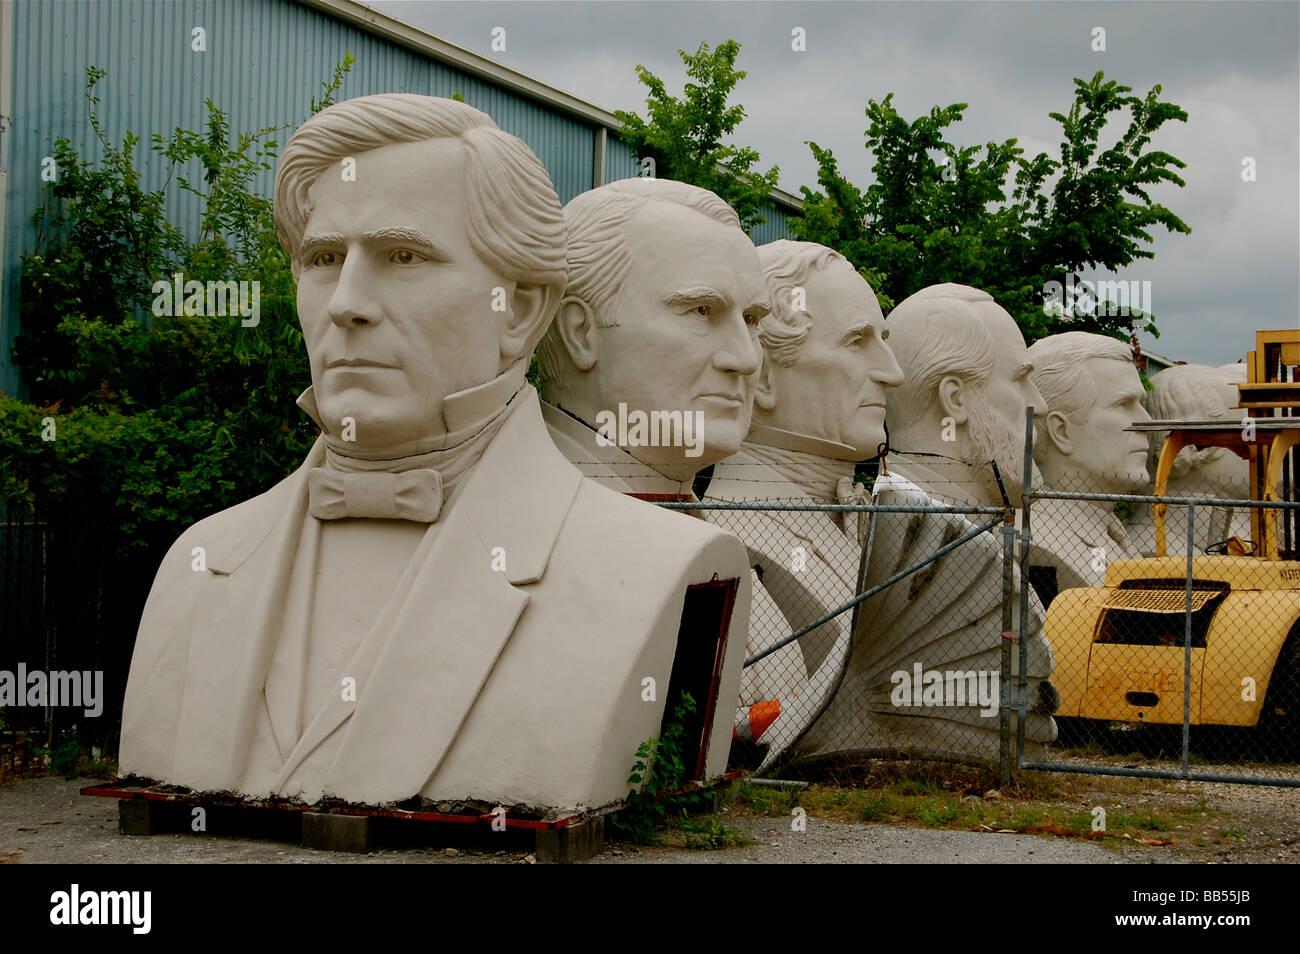 President's Heads at David Adicke's Studio in Houston, Texas Stock Photo